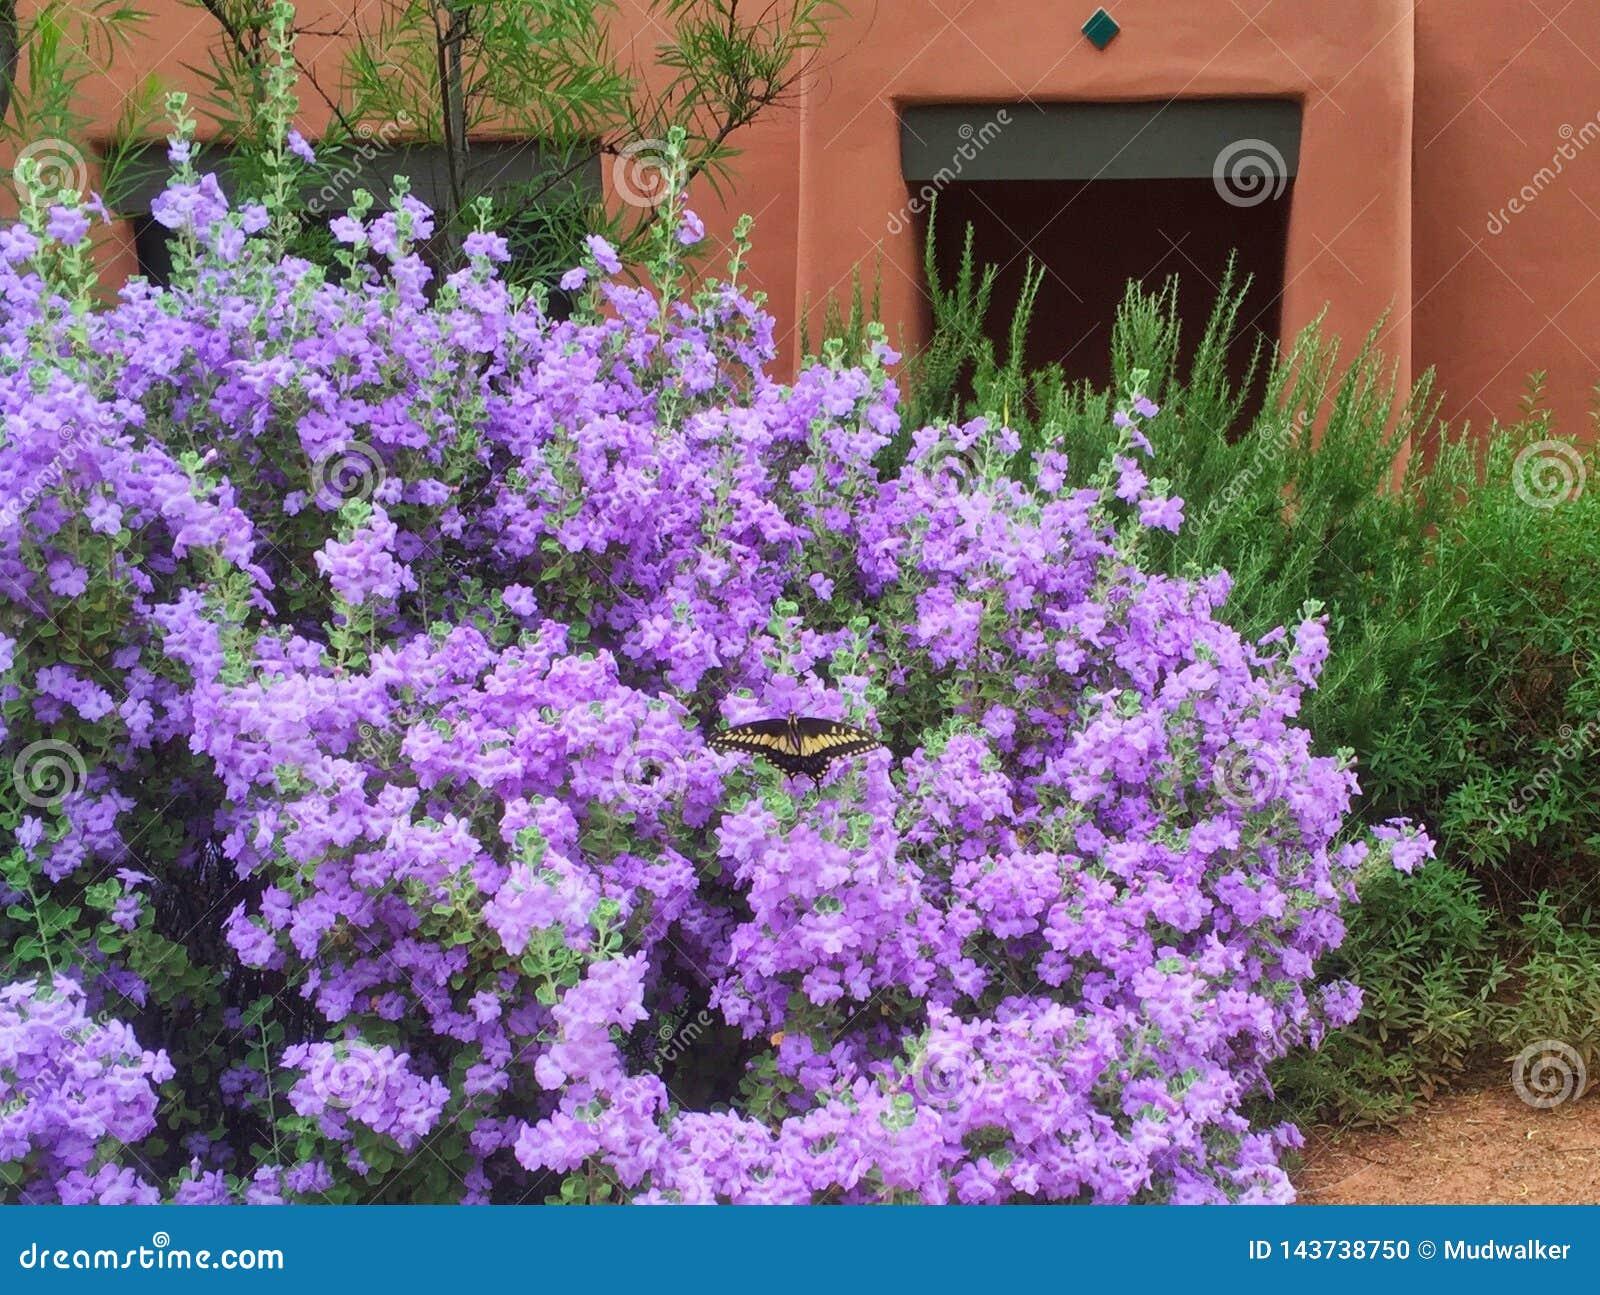 Lavender Μπους και πεταλούδα έξω από Enchantment Casita